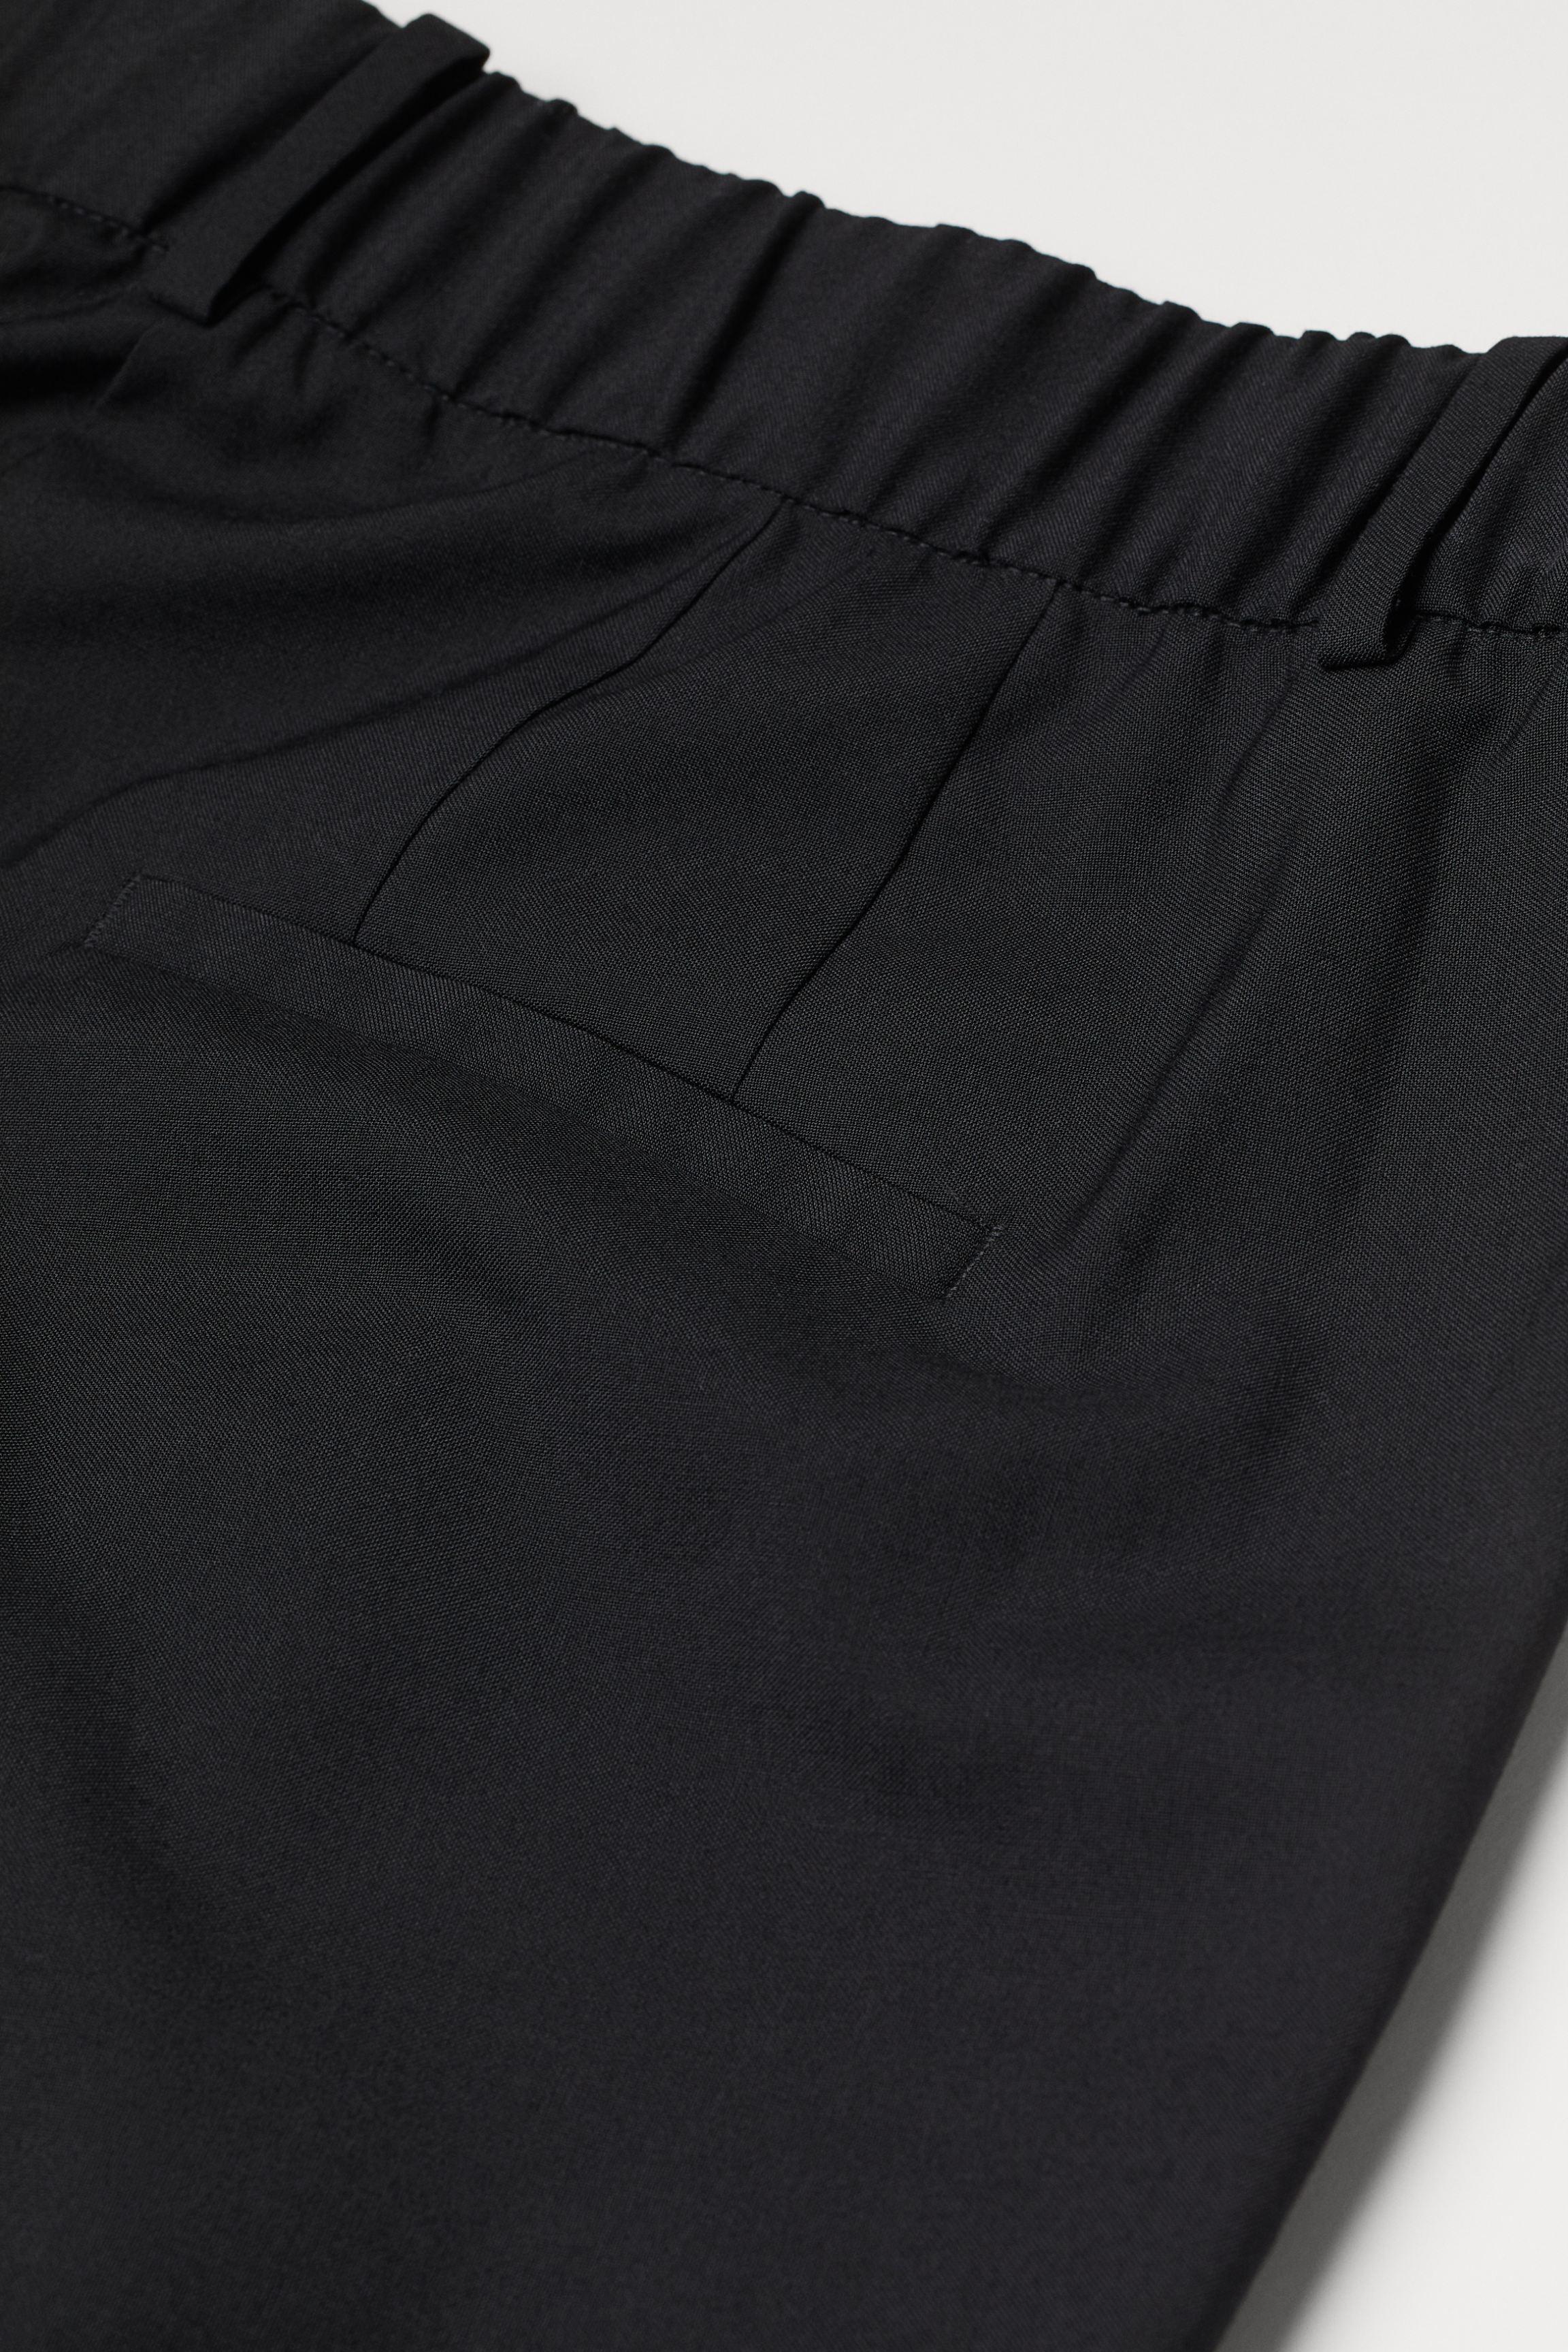 H&M+ Ankle-length Pants